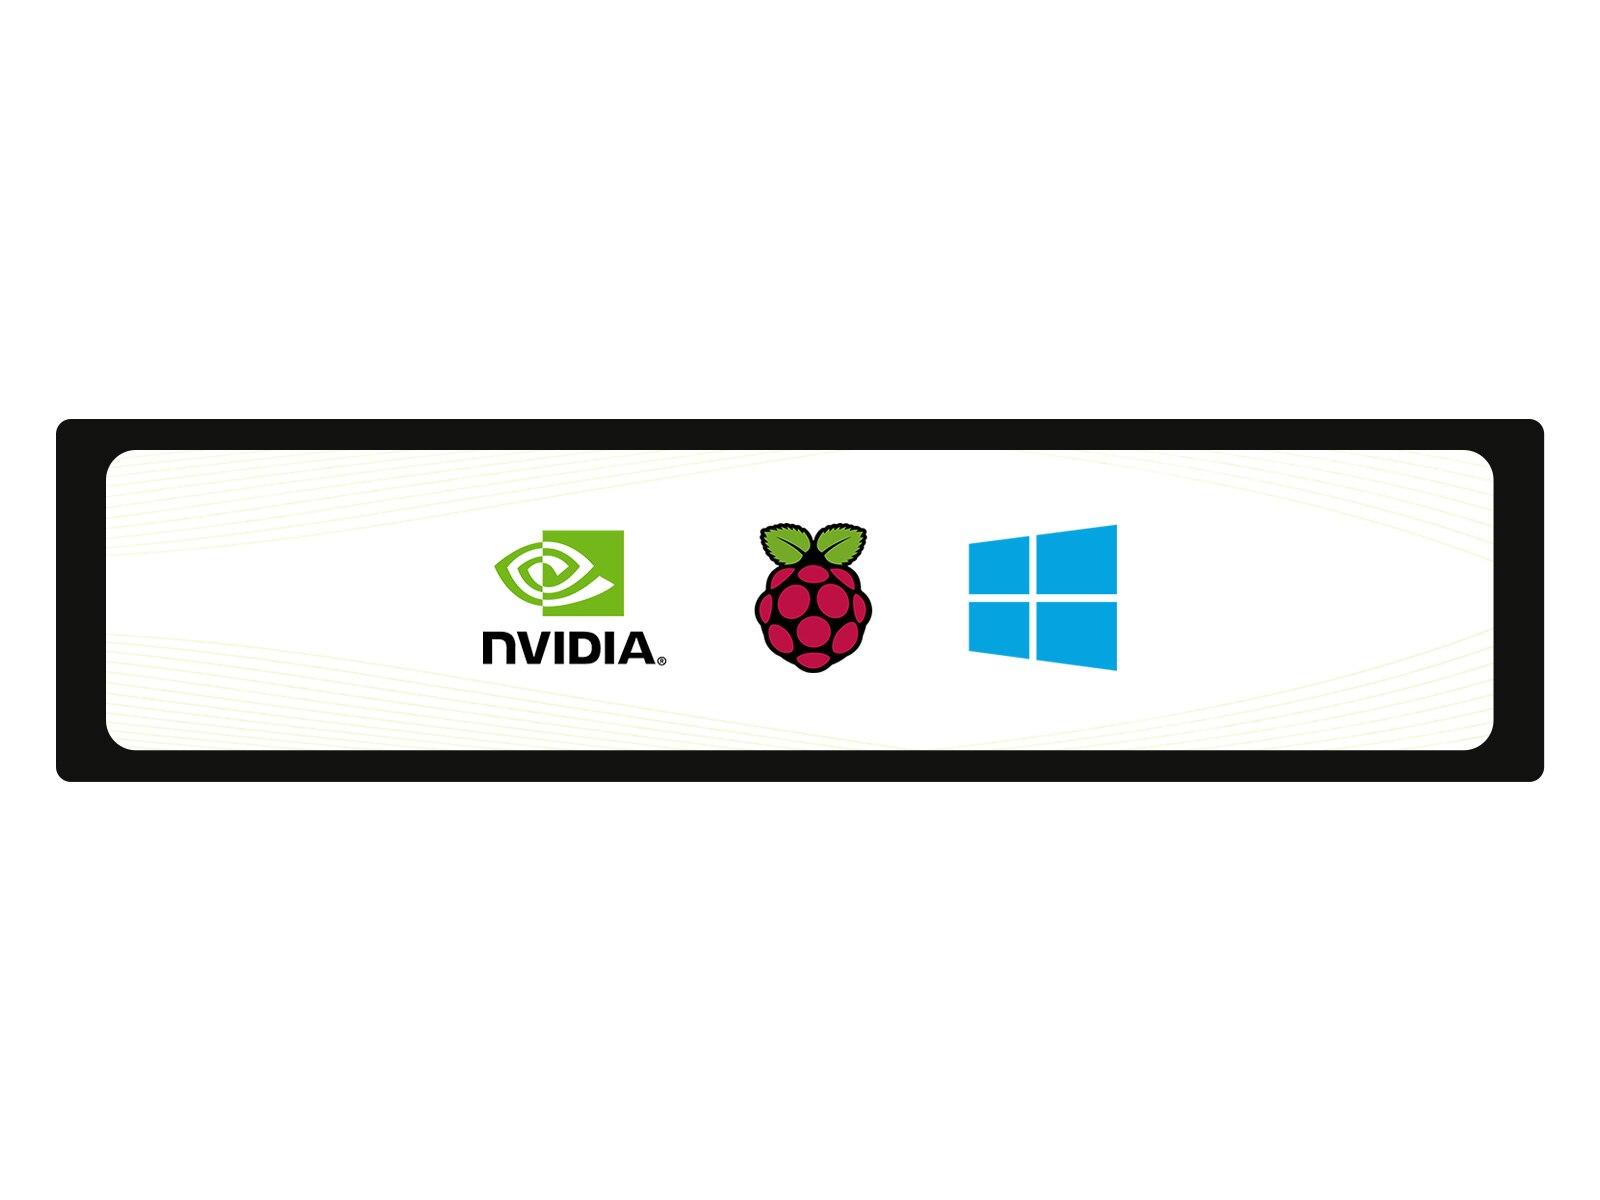 Waveshare 11.9 بوصة بالسعة شاشة تعمل باللمس LCD ، 320 × 1480 القرار ، IPS ، تشديد غطاء زجاجي ، منفذ USB ، يدعم التوت بي